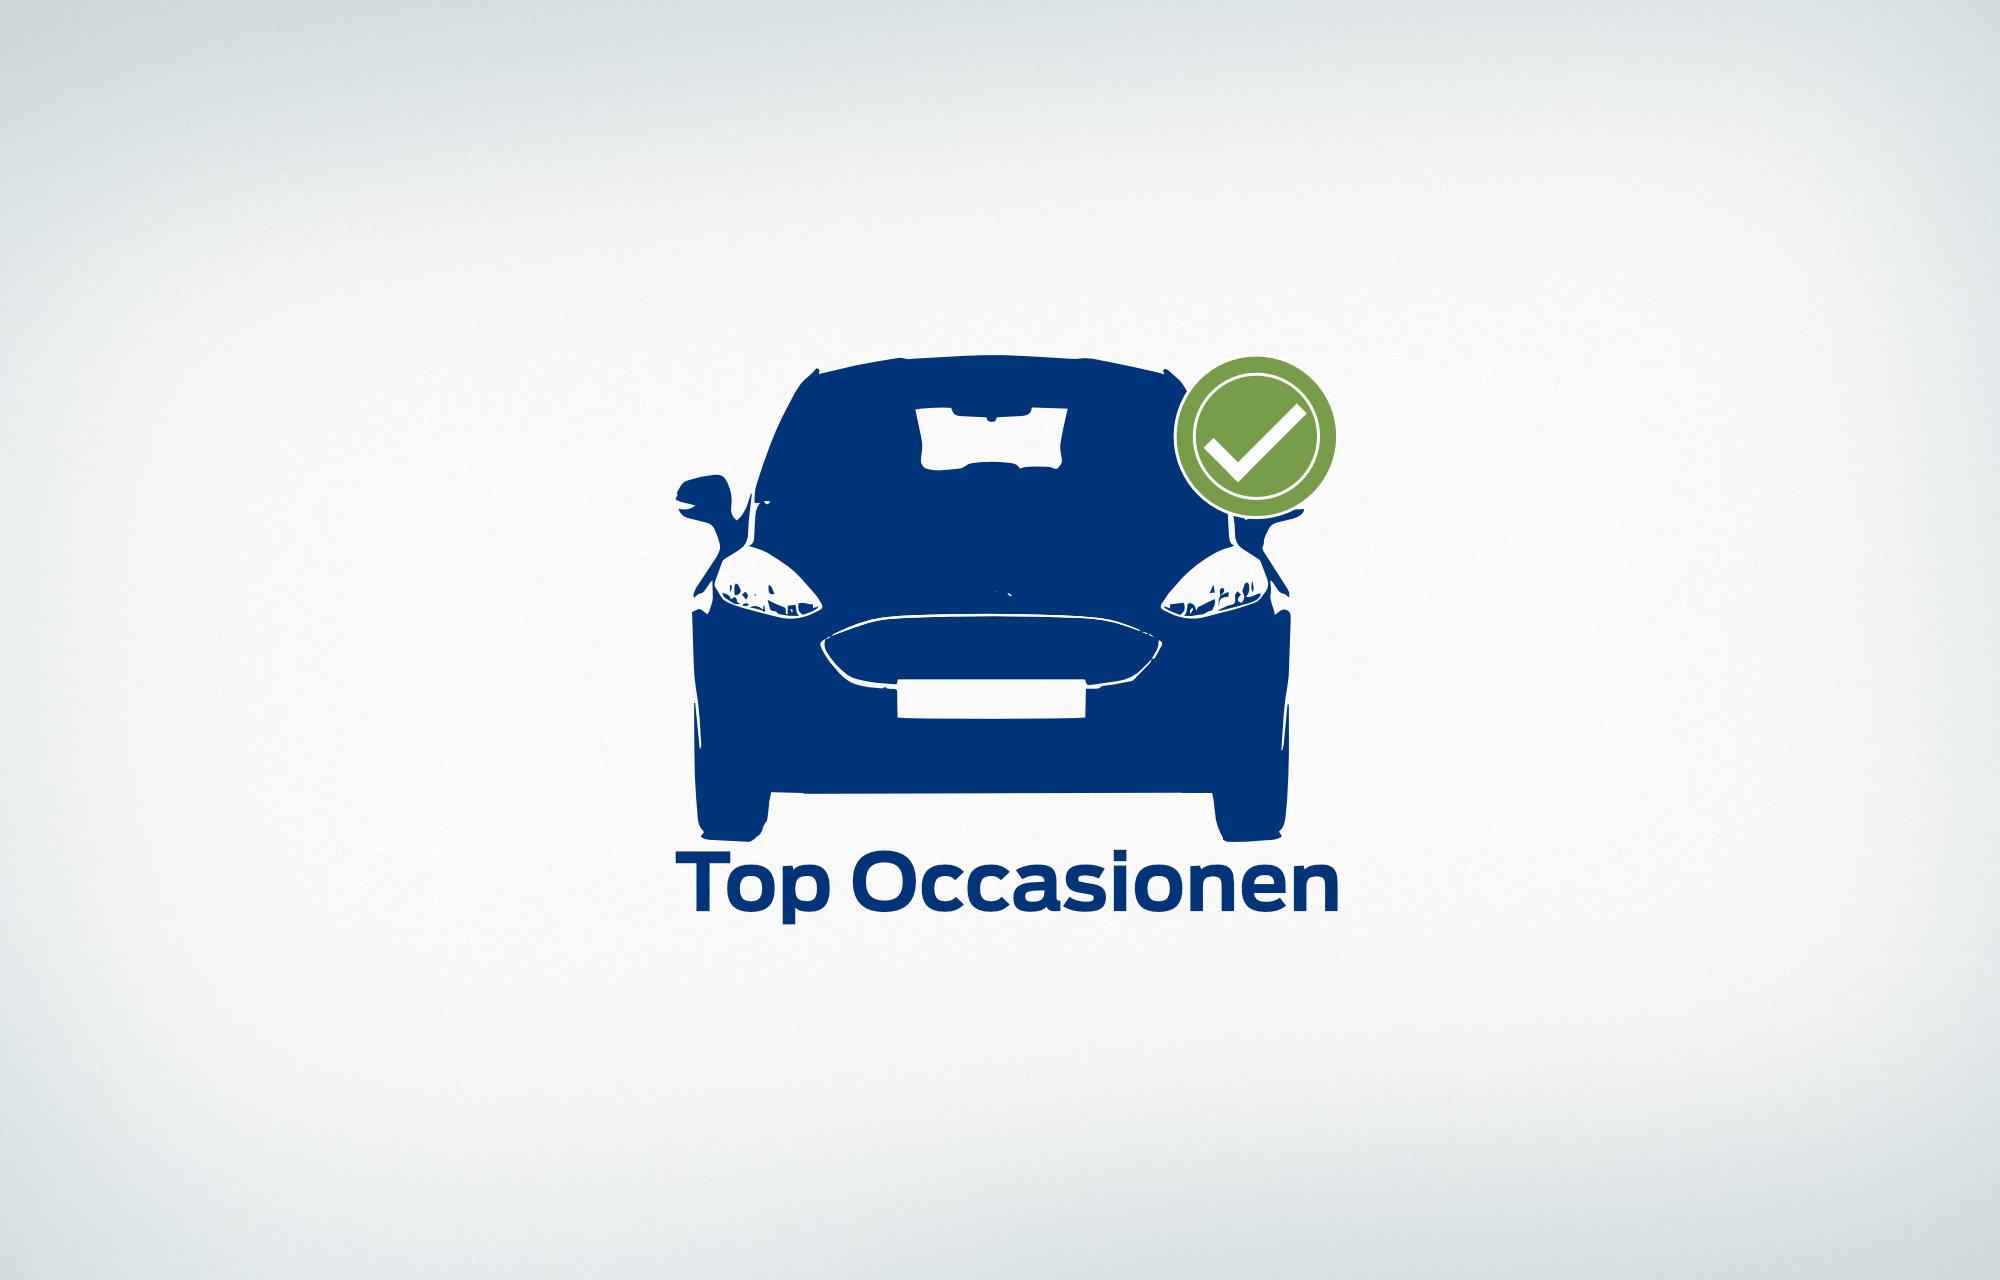 Top Occasionen